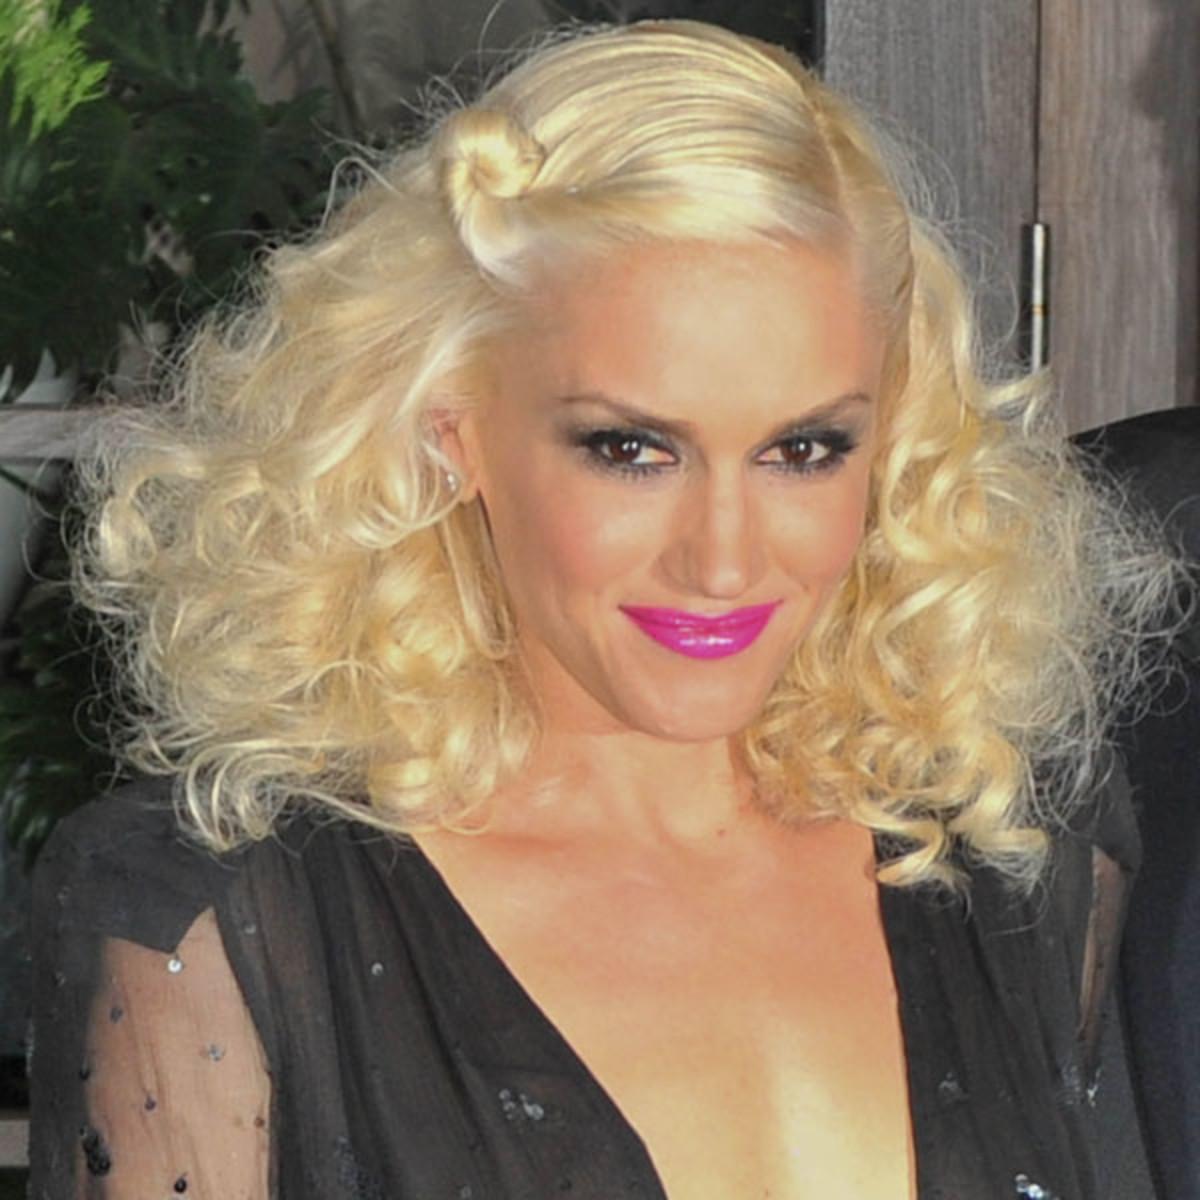 Gwen-Stefani-Cannes-2011-2